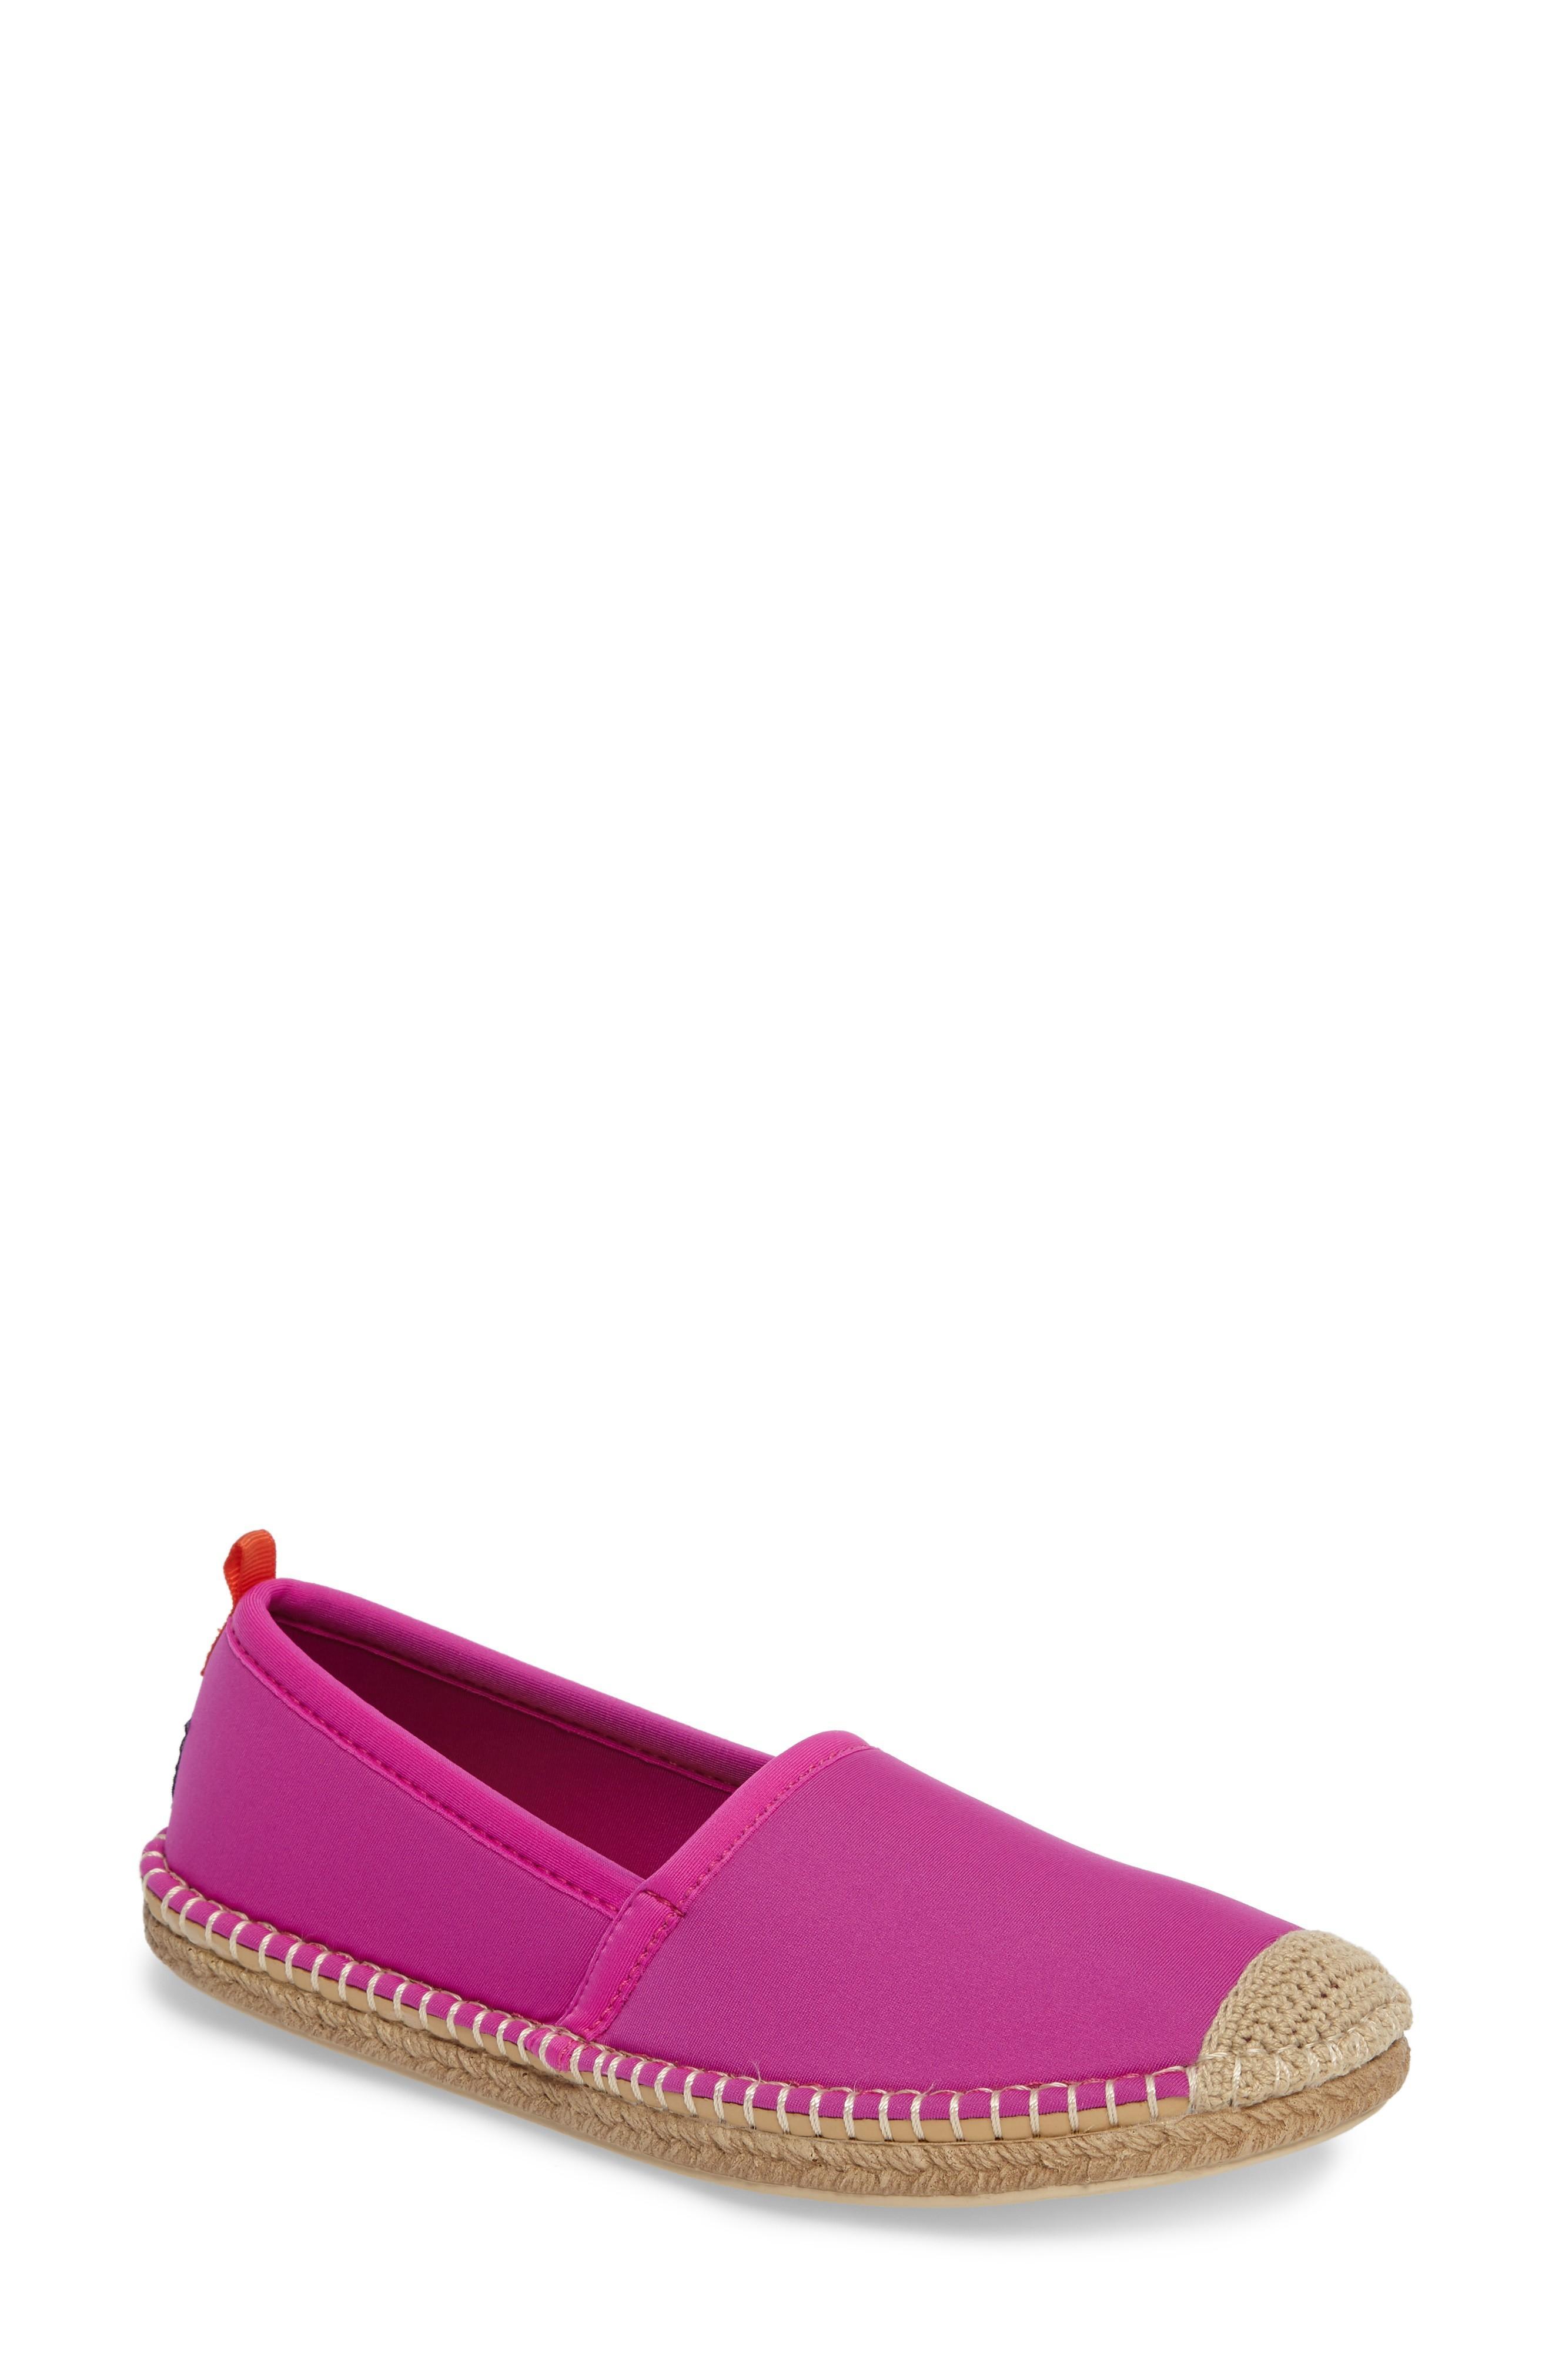 2bdb09ca2365 Sea Star Beachwear Beachcomber Espadrille Water Shoe In Hot Pink ...